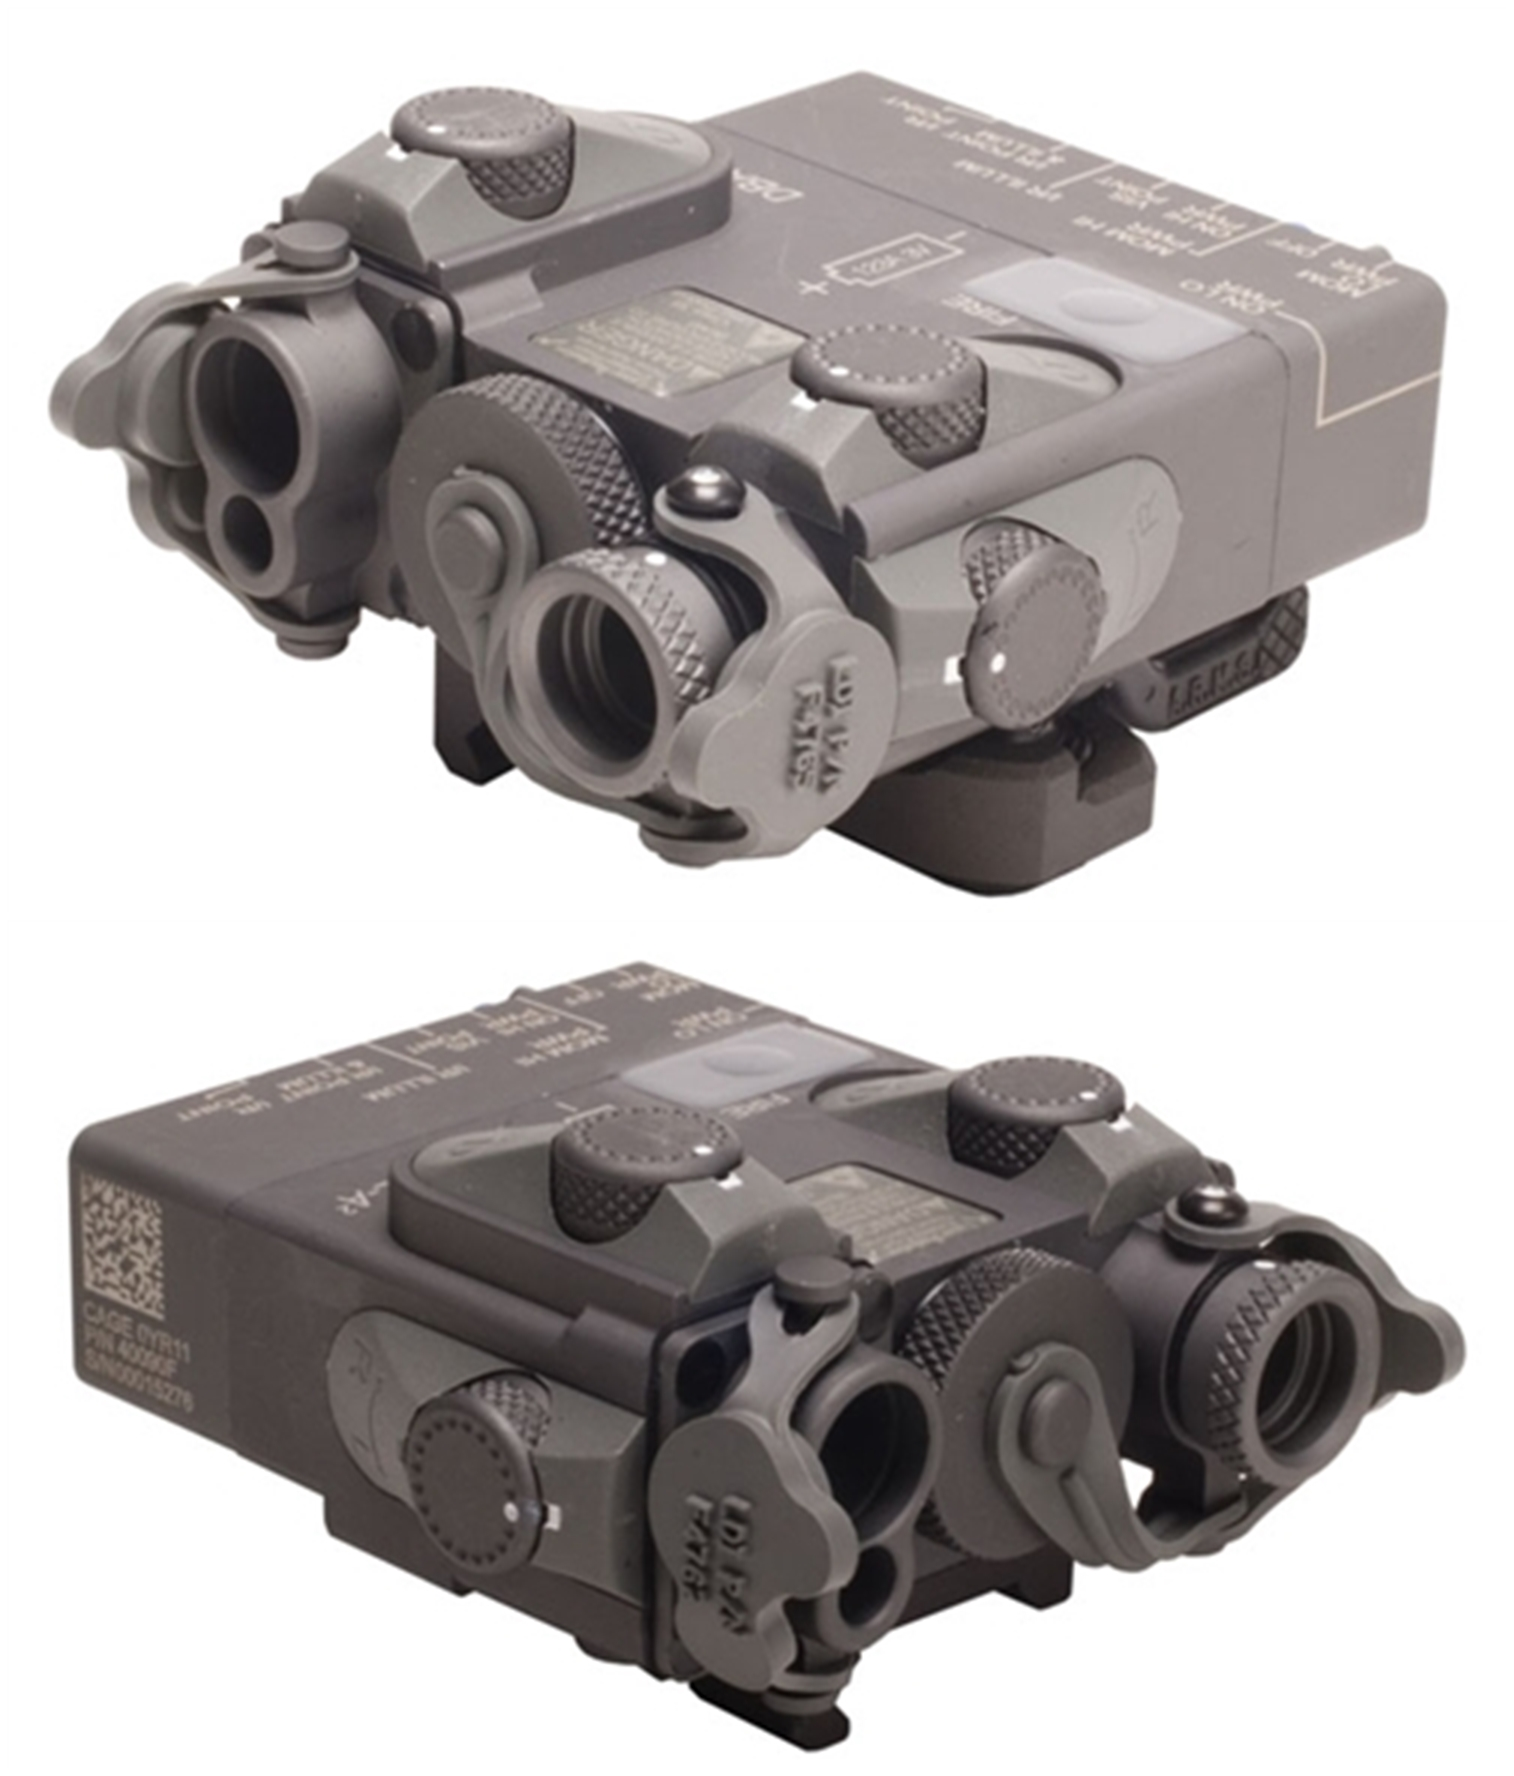 0 G&P PEQ-15A DBAL-A2 Red-IR GP959 IR 赤外線 ポイントライト & IRレーザー ナイトビジョン 検証 比較 レビュー